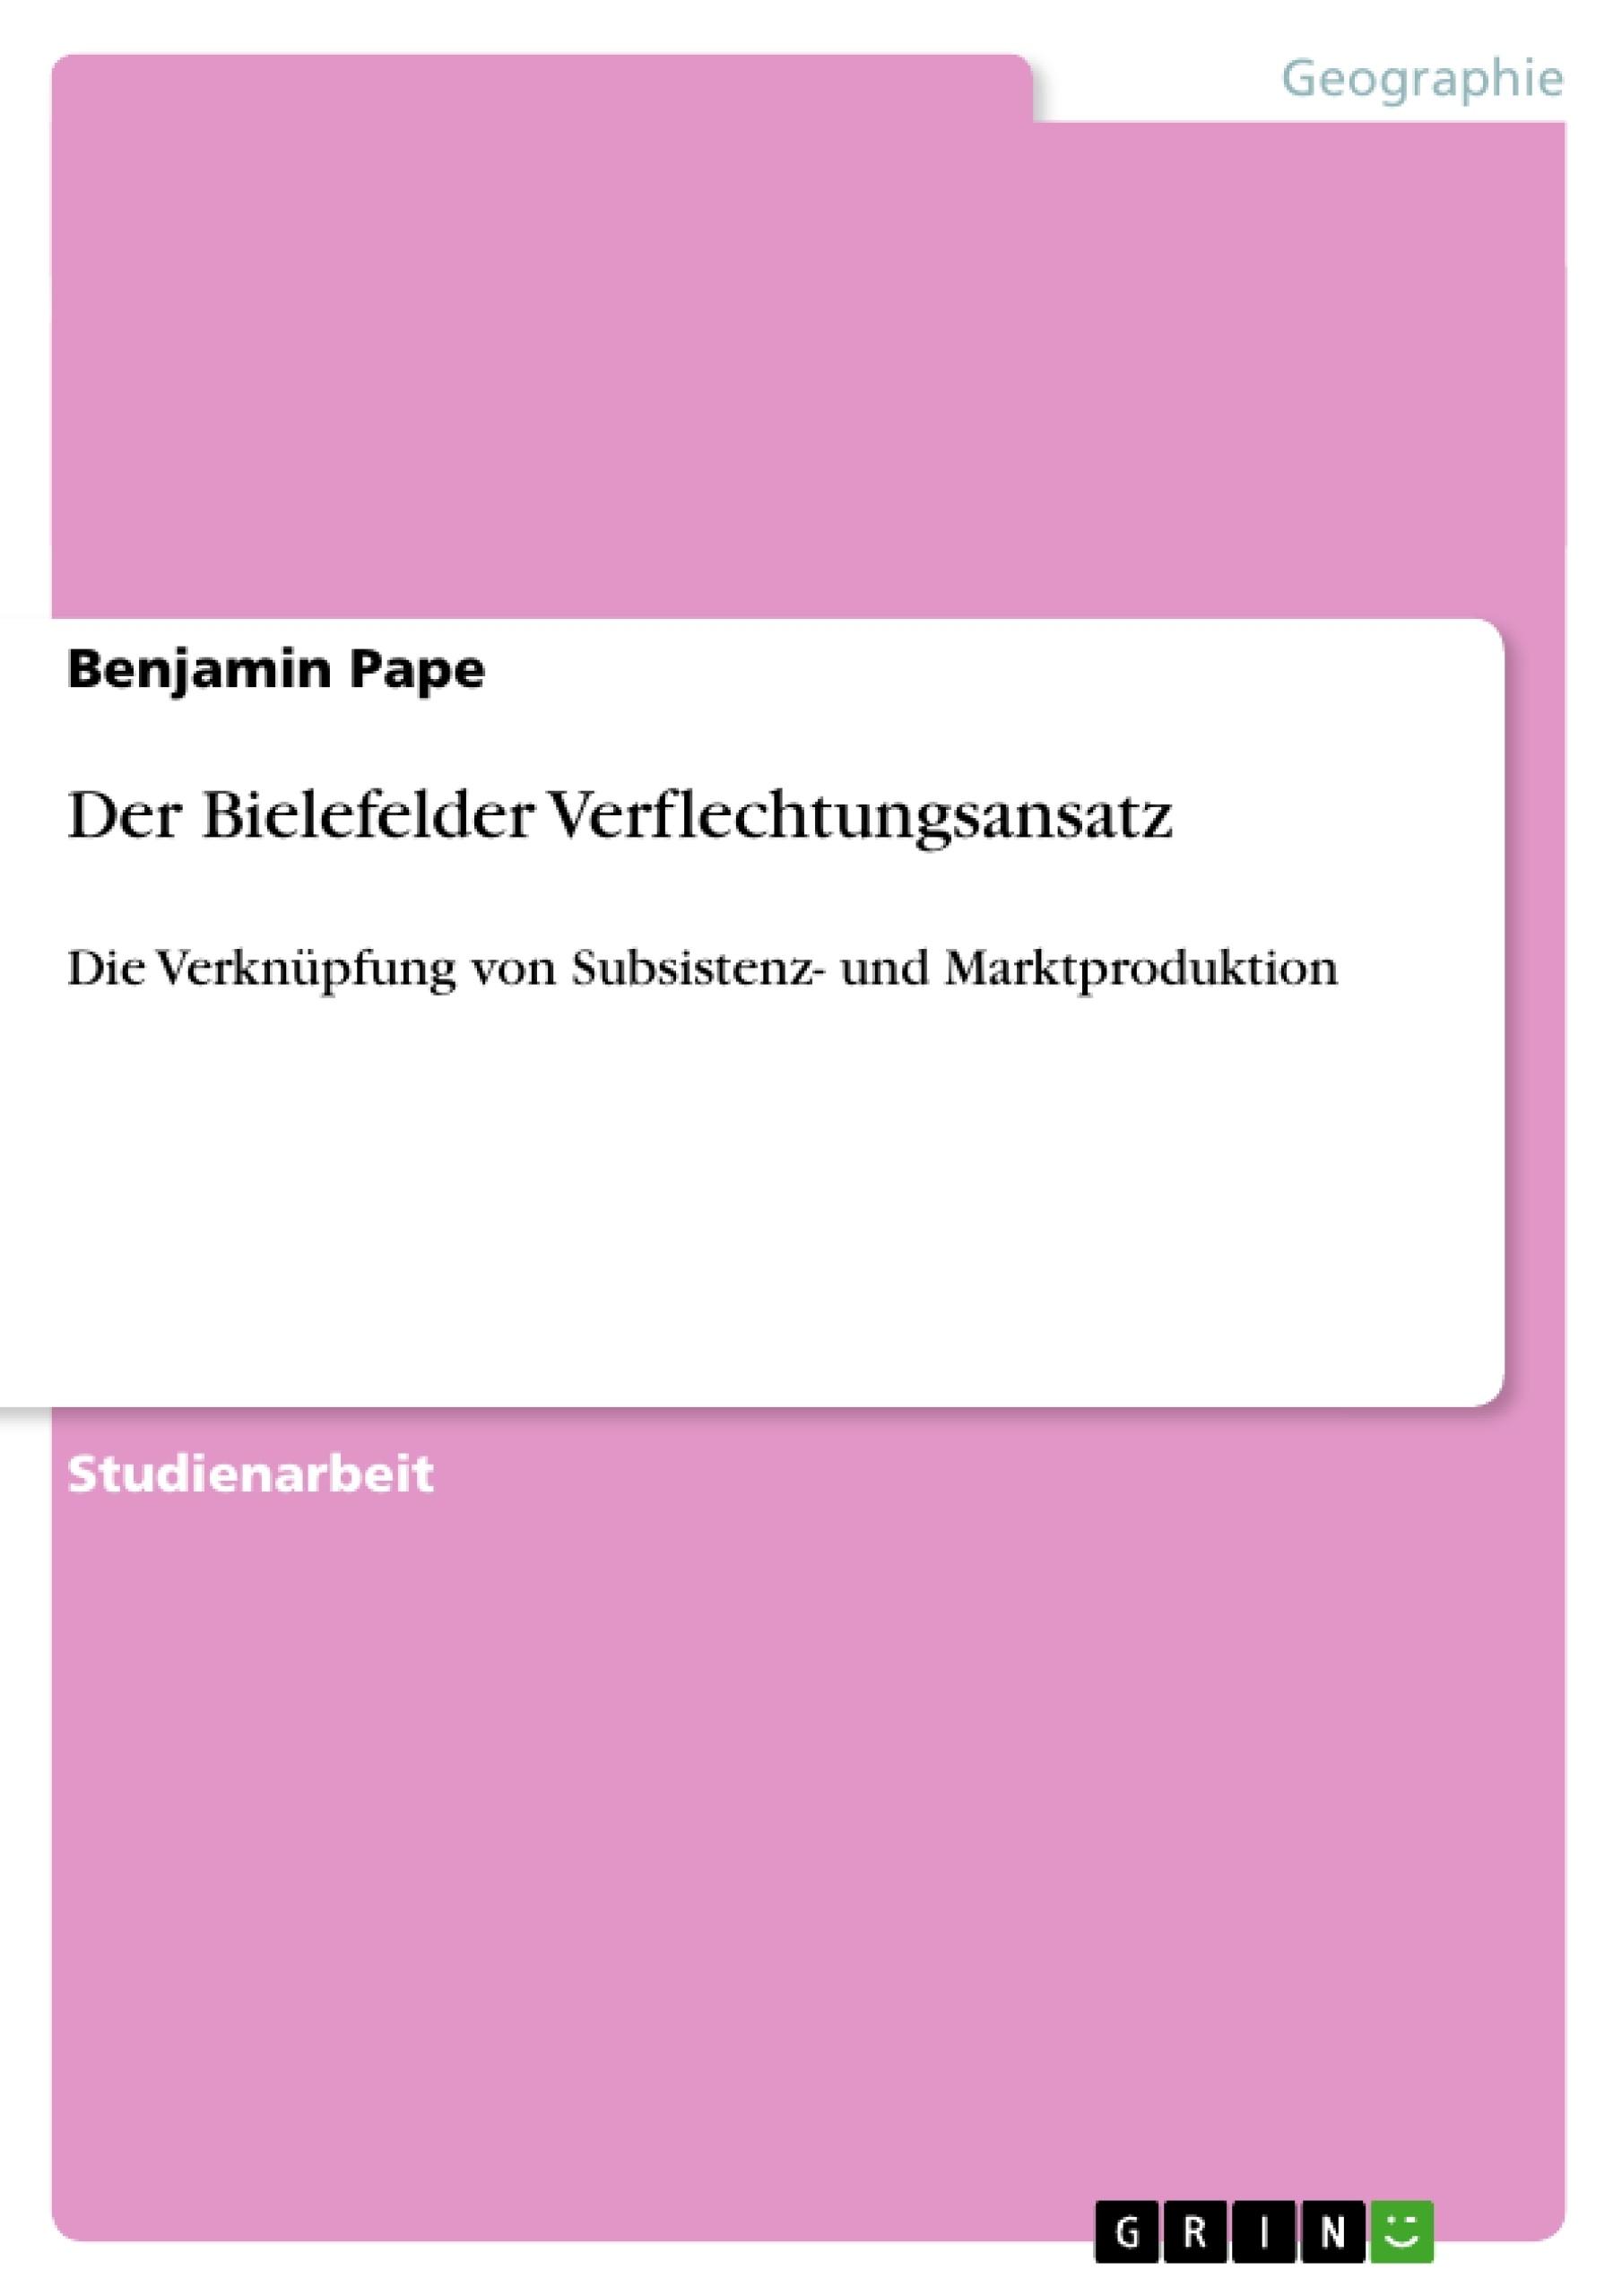 Titel: Der Bielefelder Verflechtungsansatz